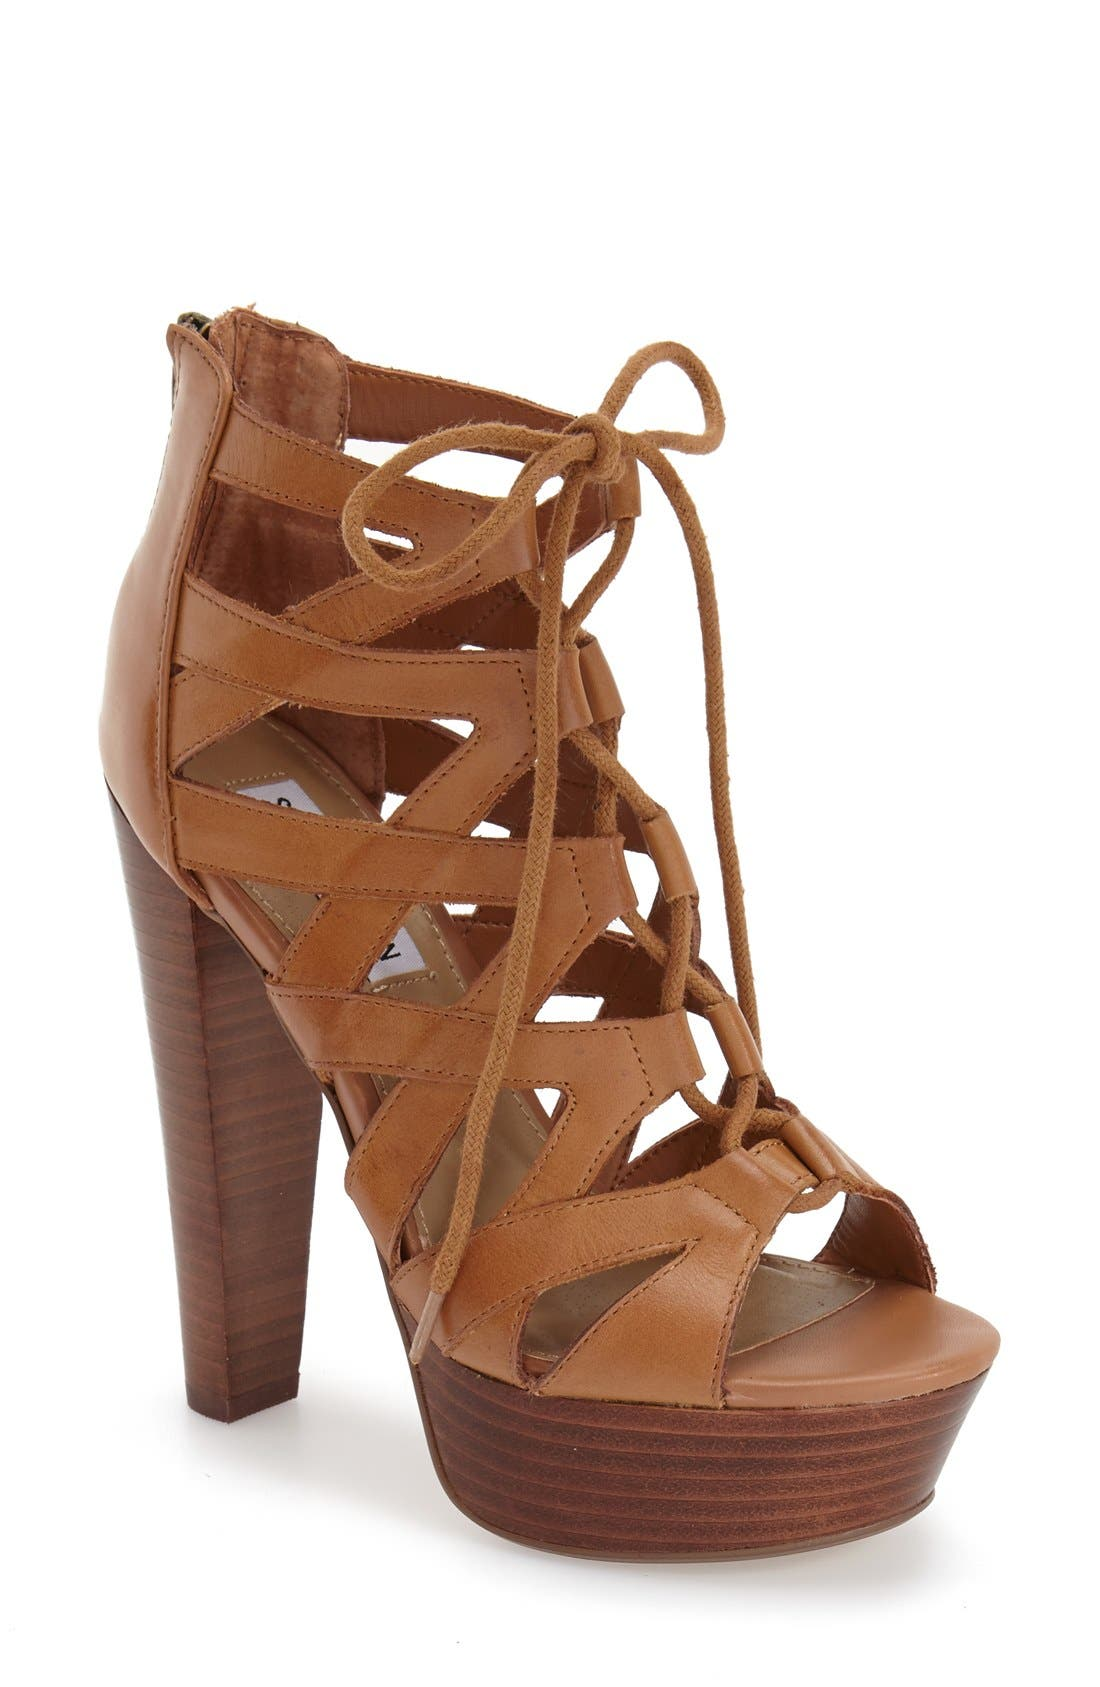 Alternate Image 1 Selected - Steve Madden 'Dreamgirl' Lace-Up Sandal (Women)